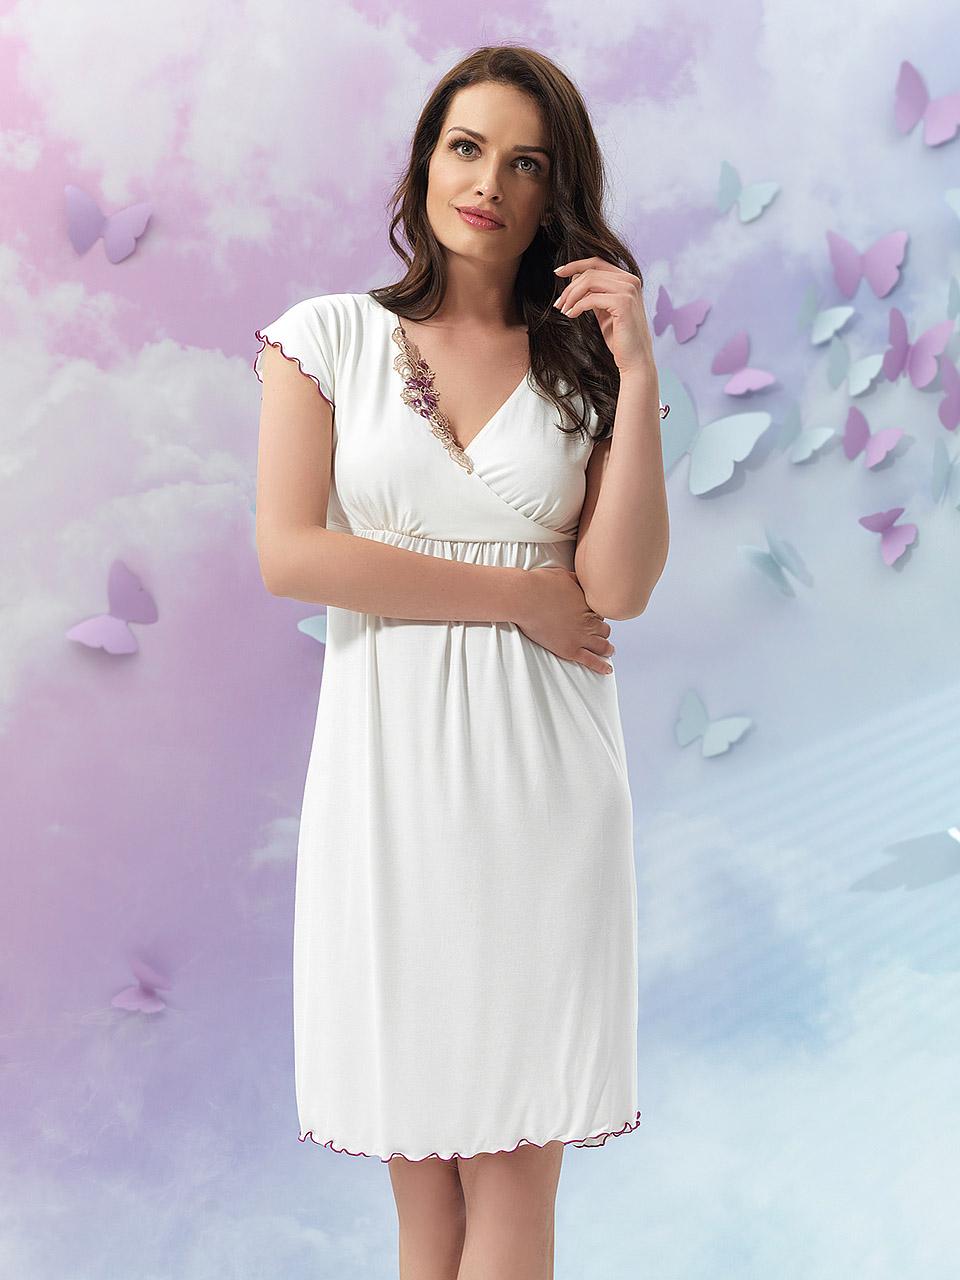 Flori 2903 Camicia da notte<br />01 Ivory, 18 Light Rose, 28 Cappuccino, 39 Lilac